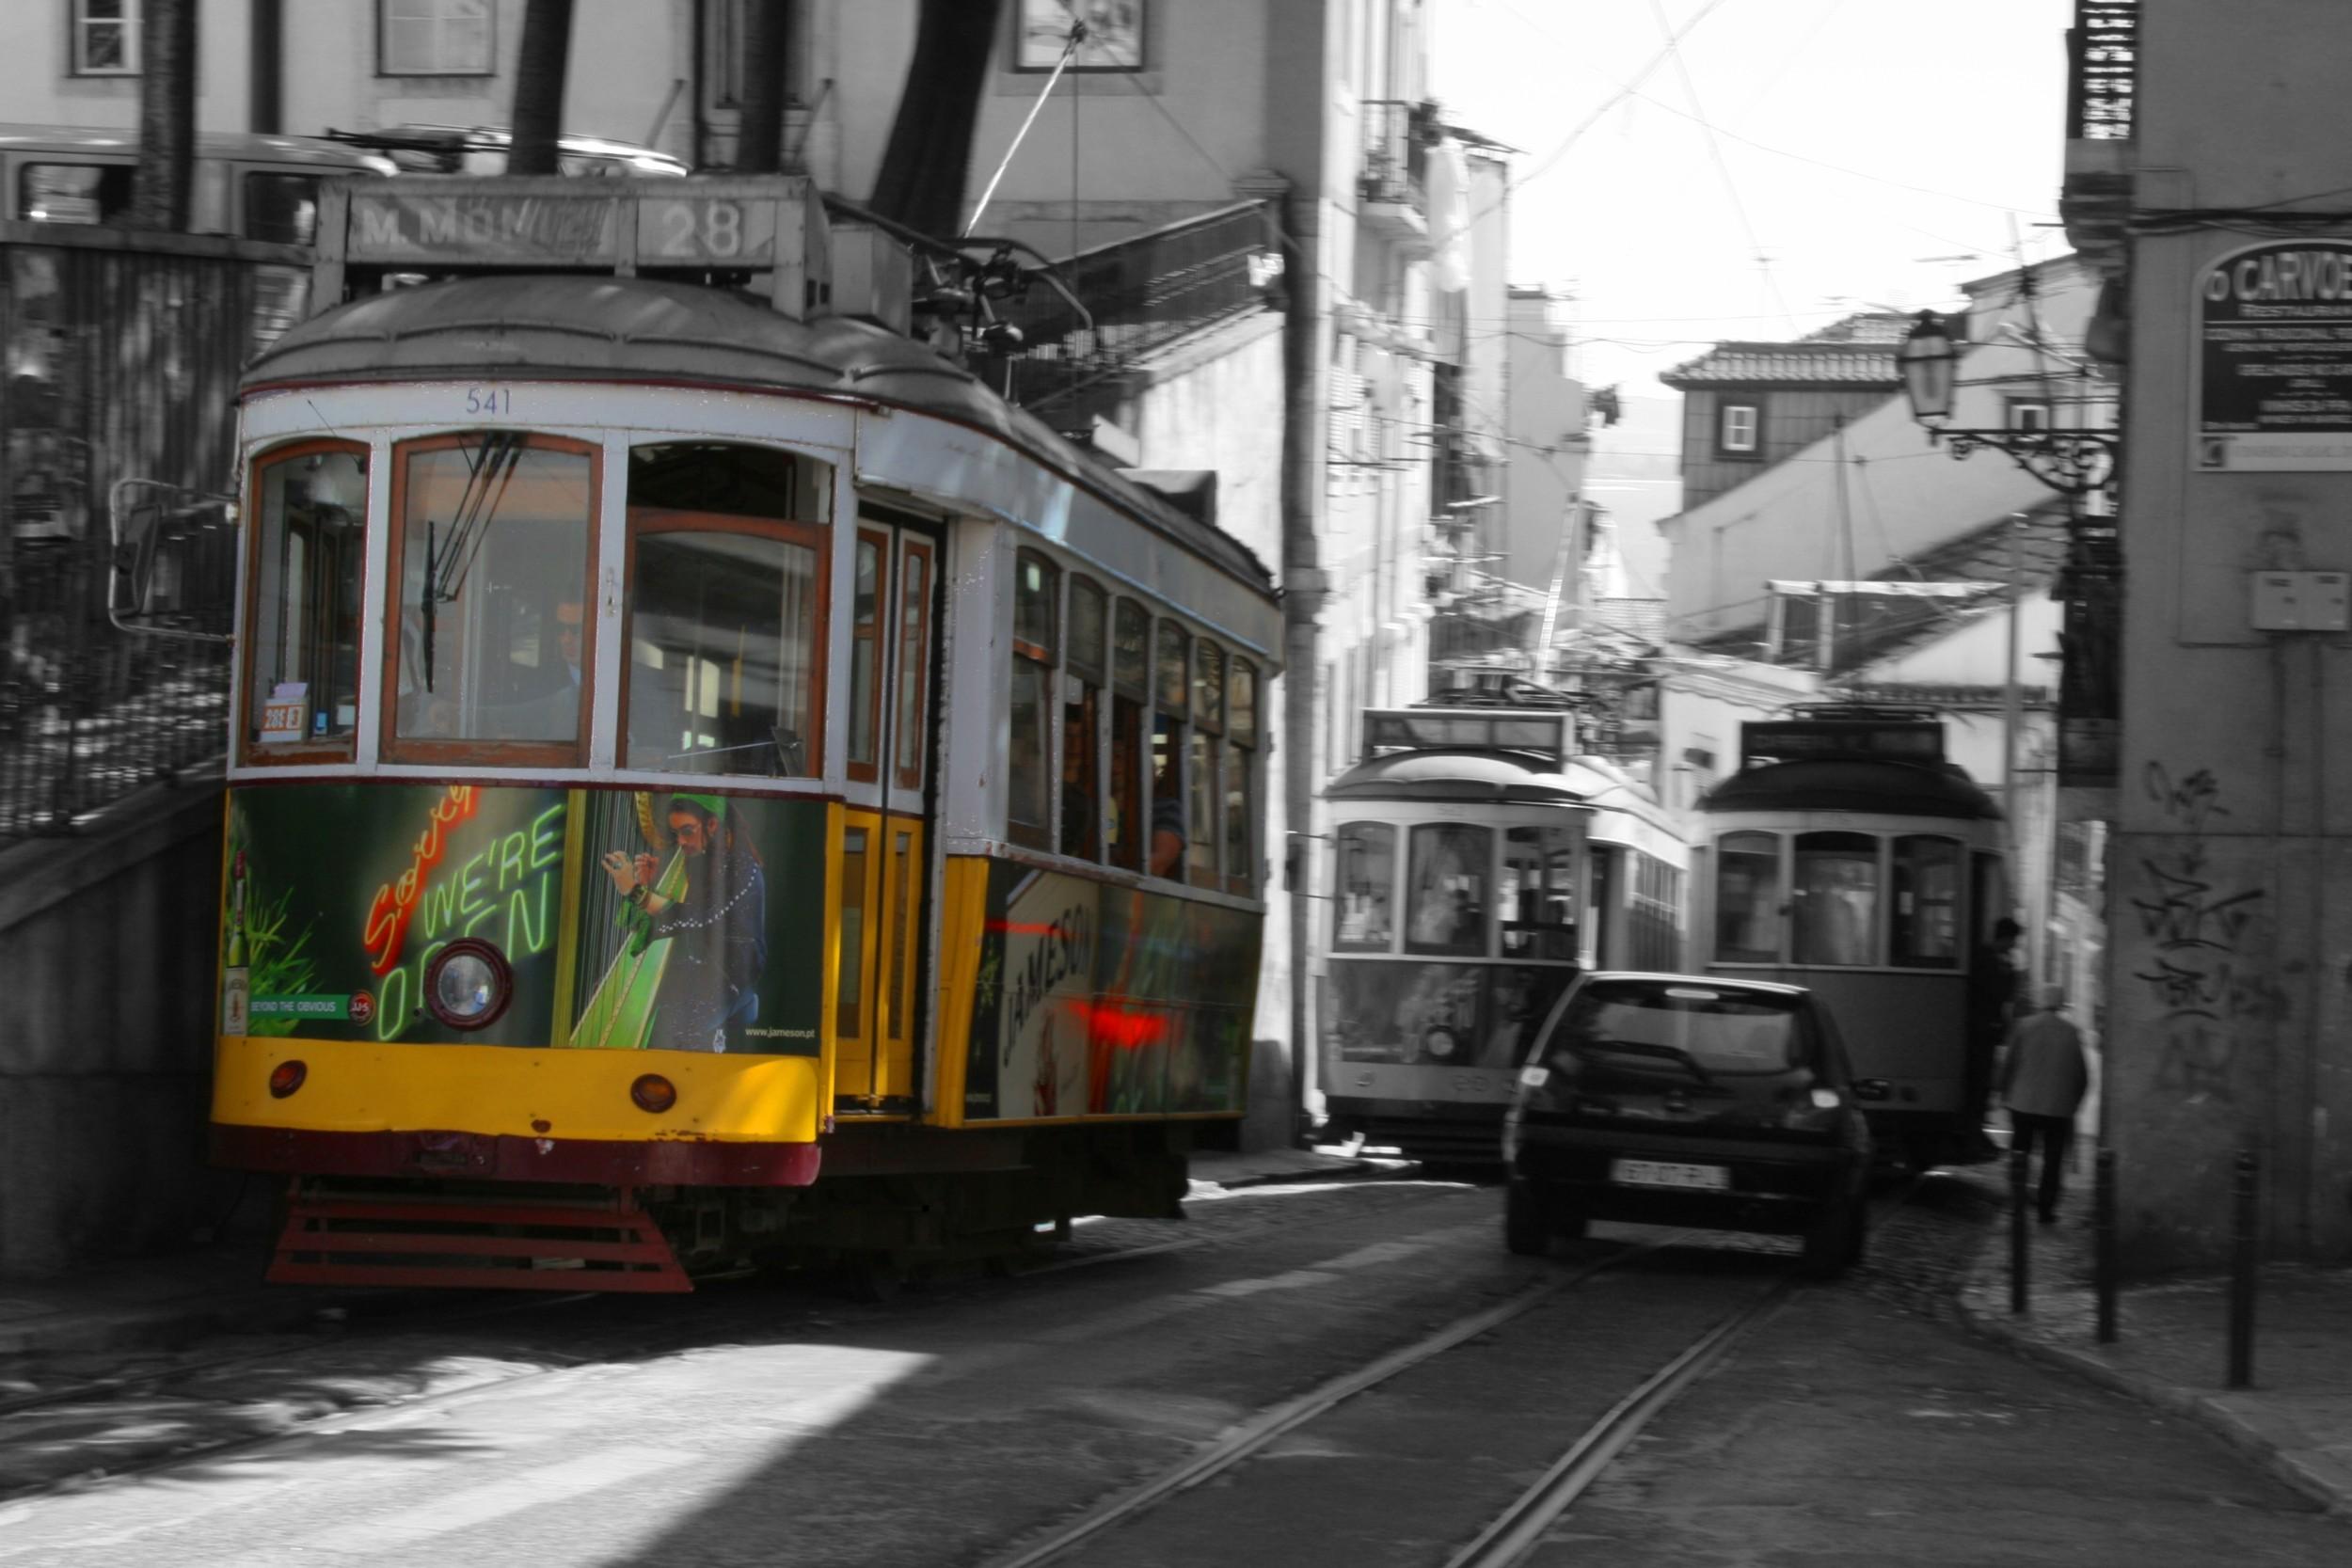 Altra immagine del tram nº 28